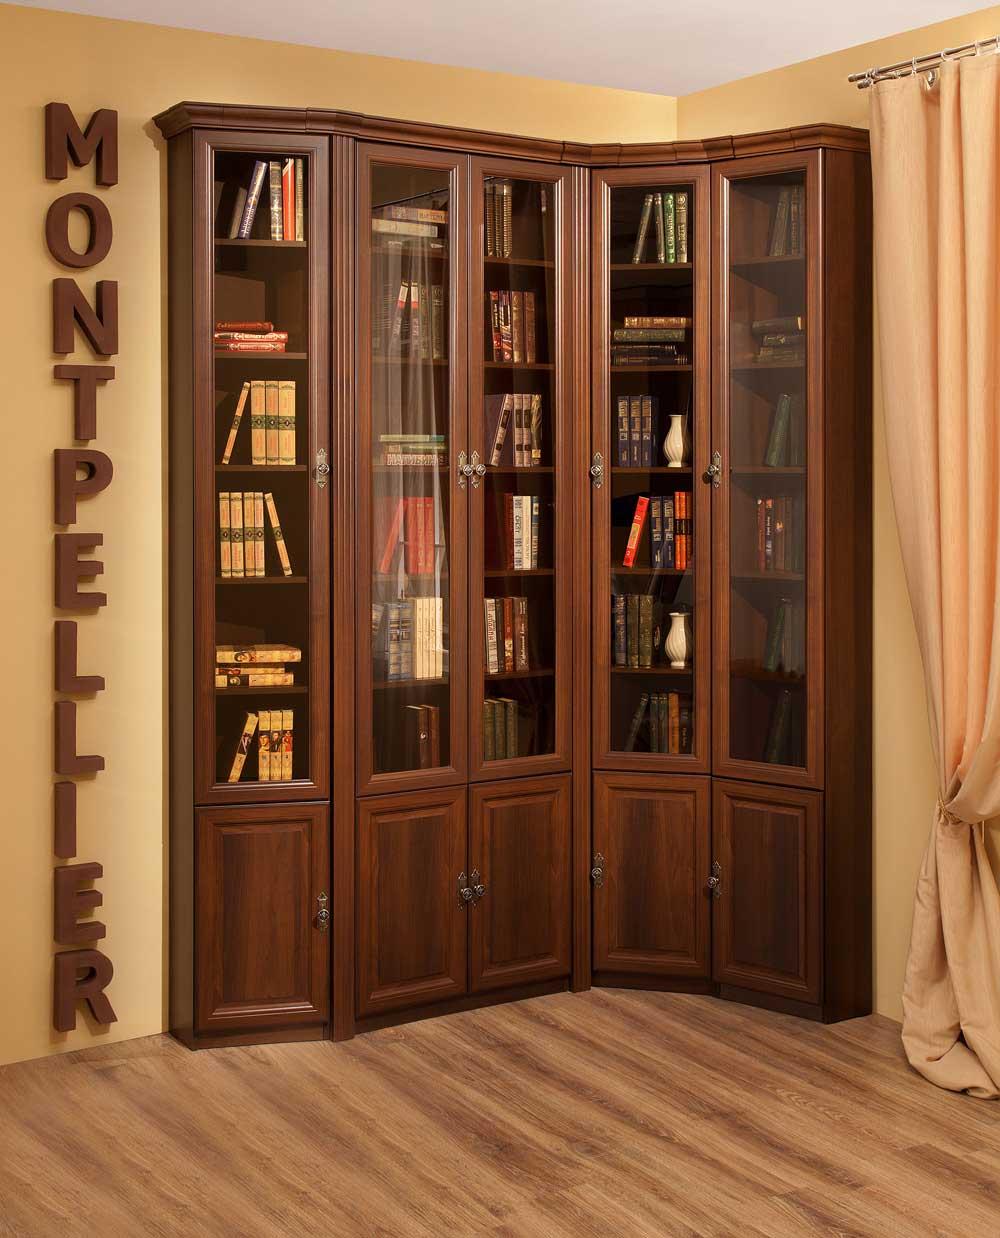 Библиотека montpellier 3 - купить за 39289.00 руб. в москве .